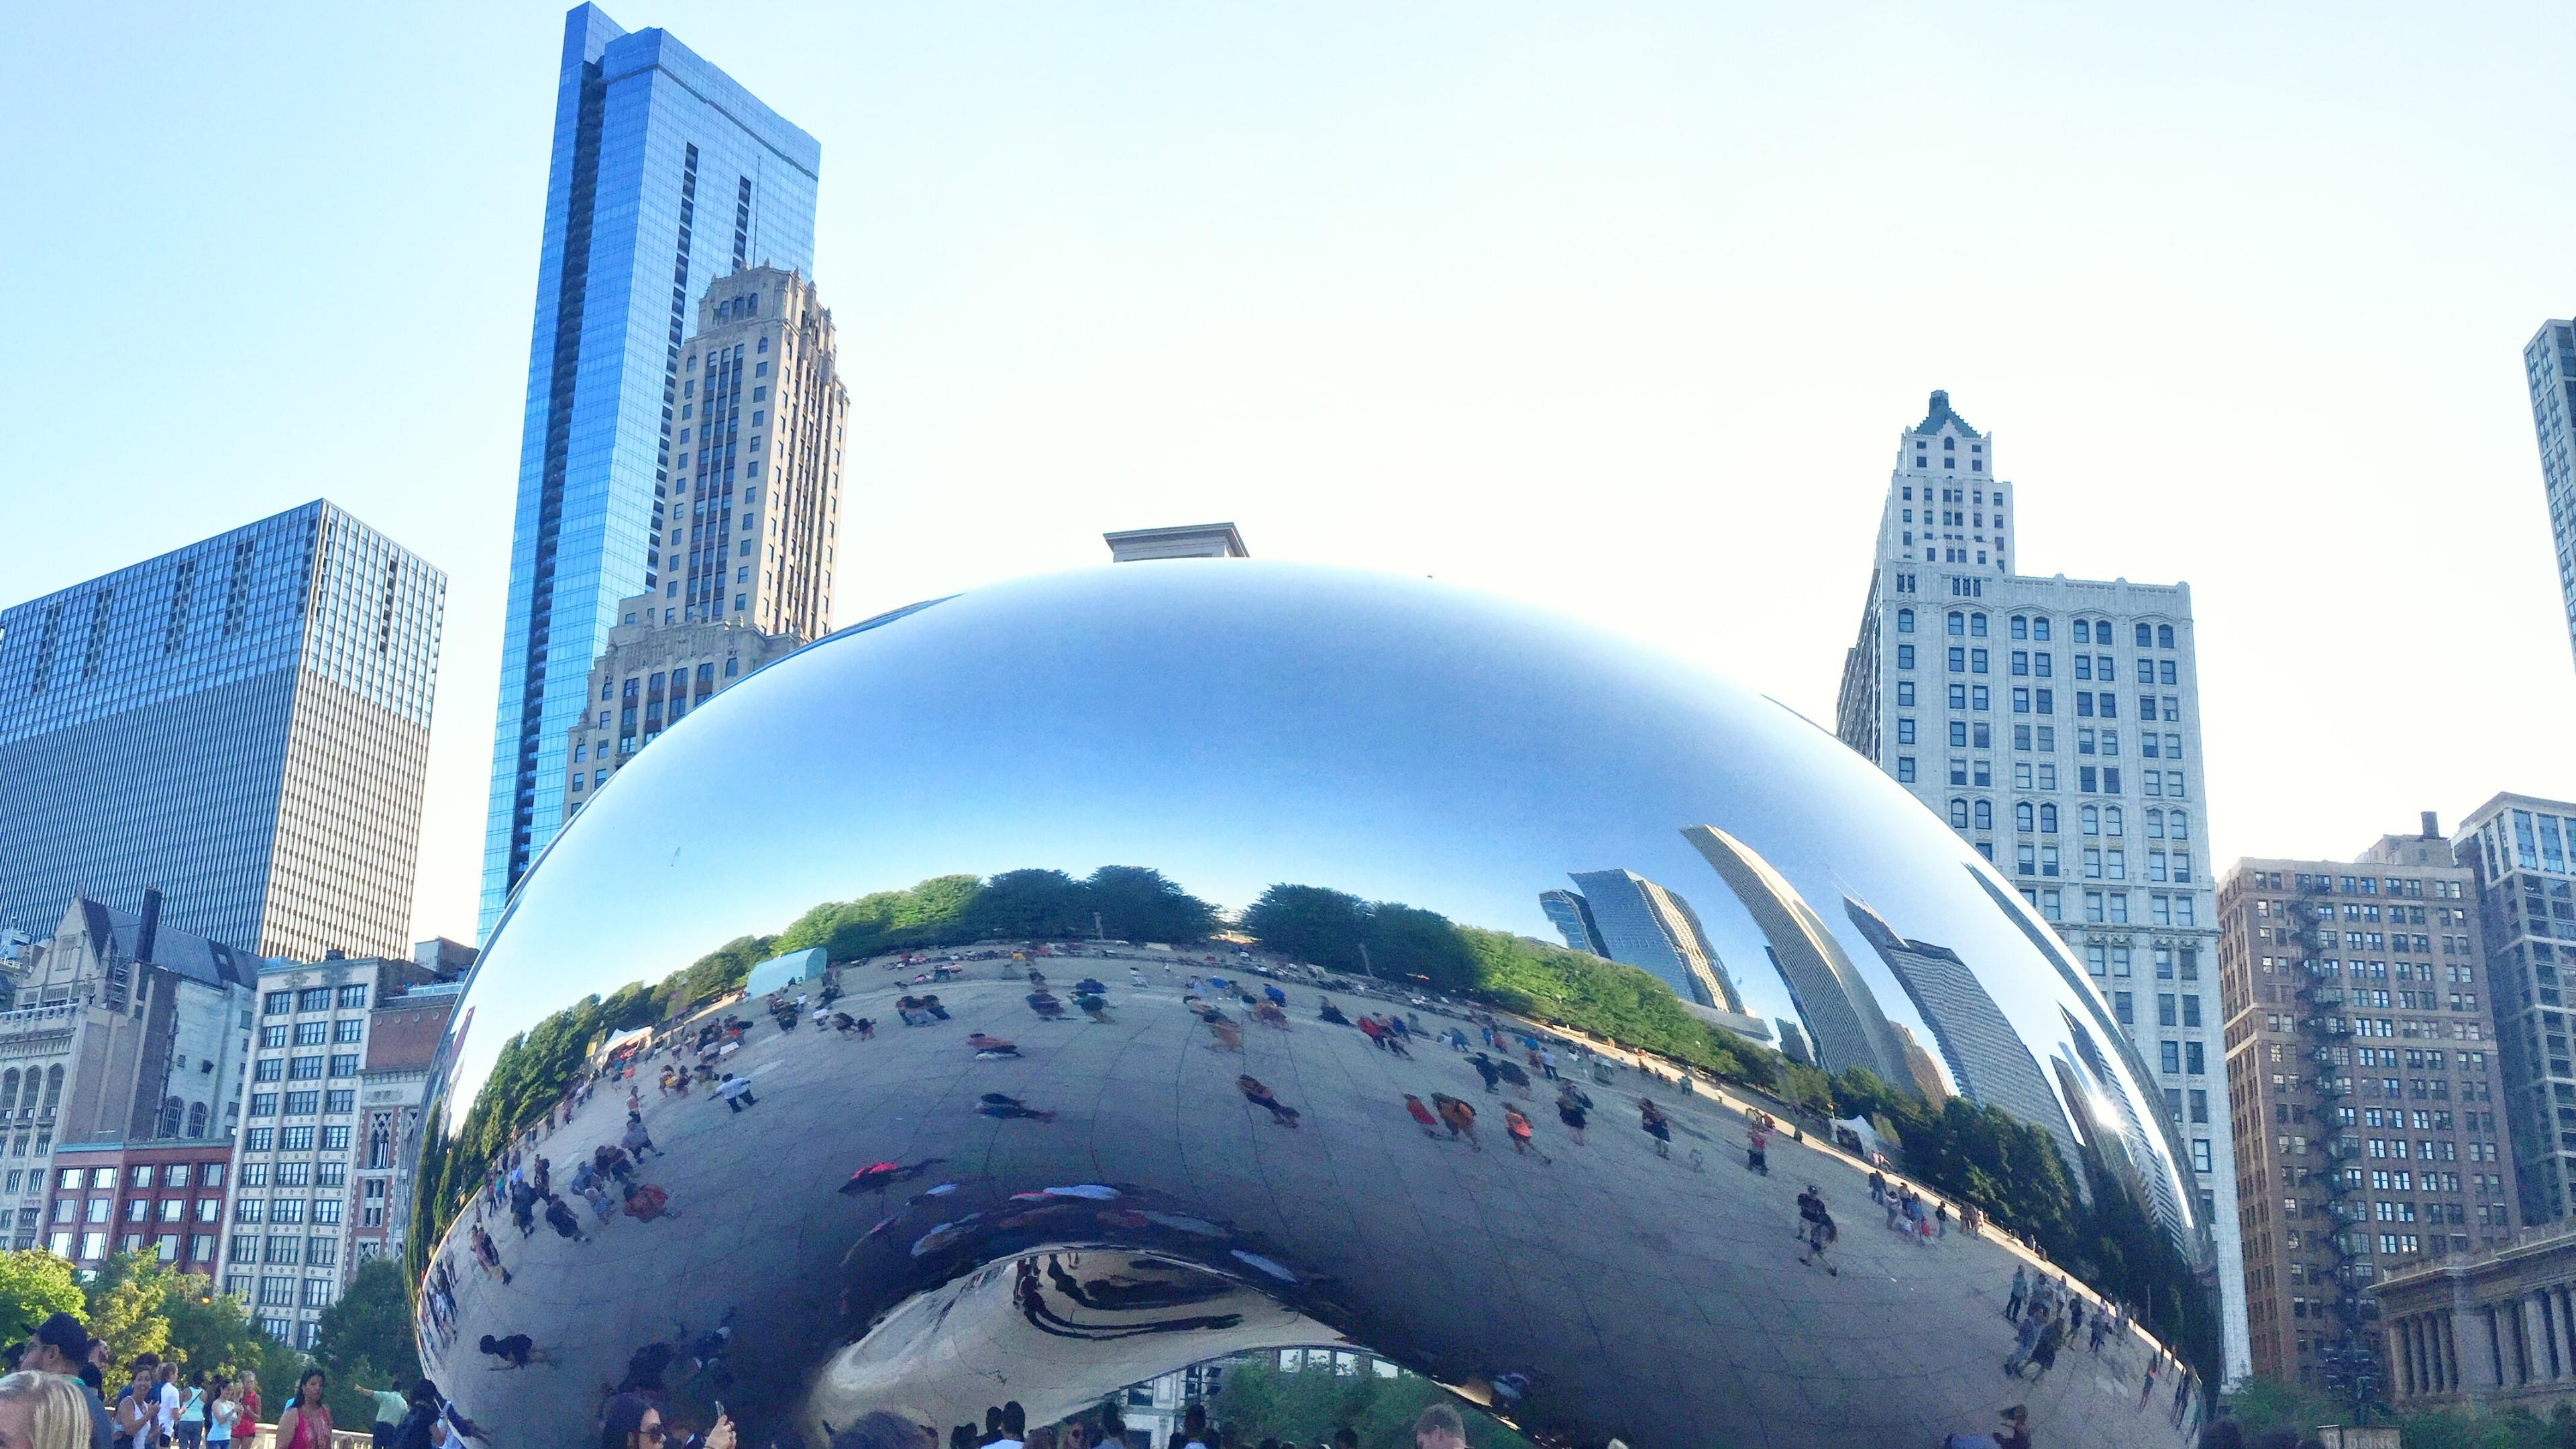 Bean, Millennium Park Chicago wallpaper